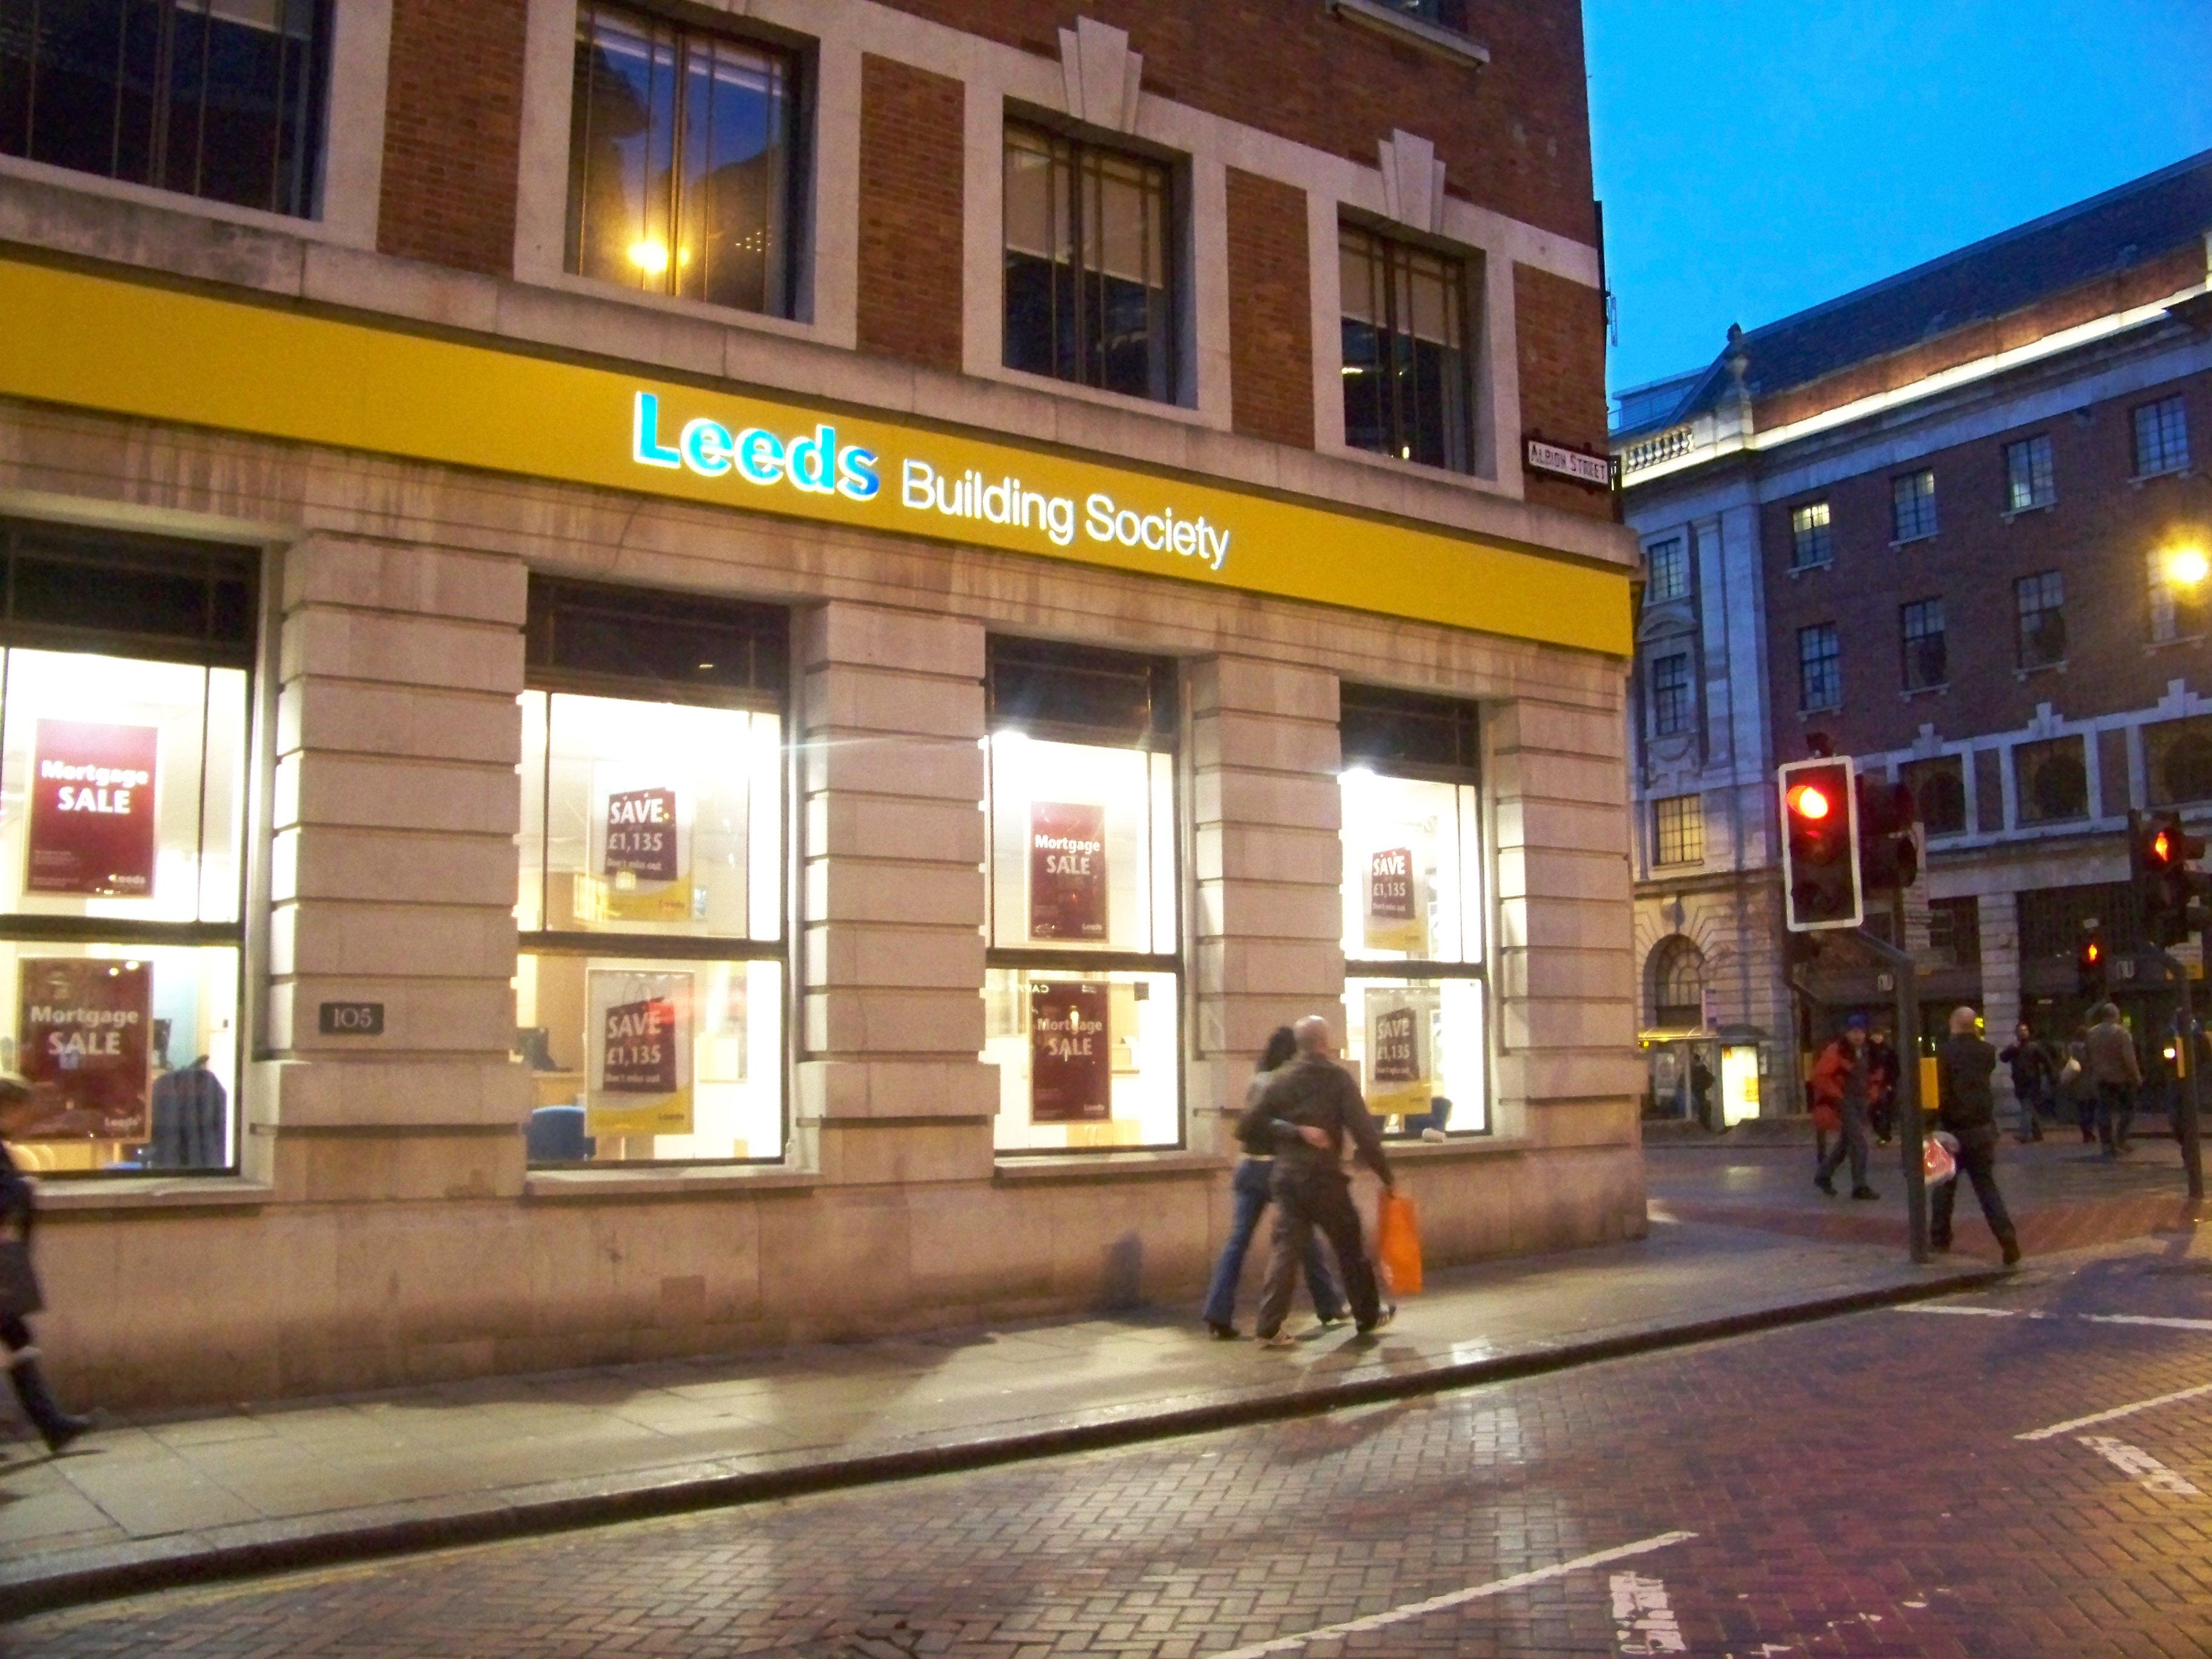 Leeds Building Society Agm